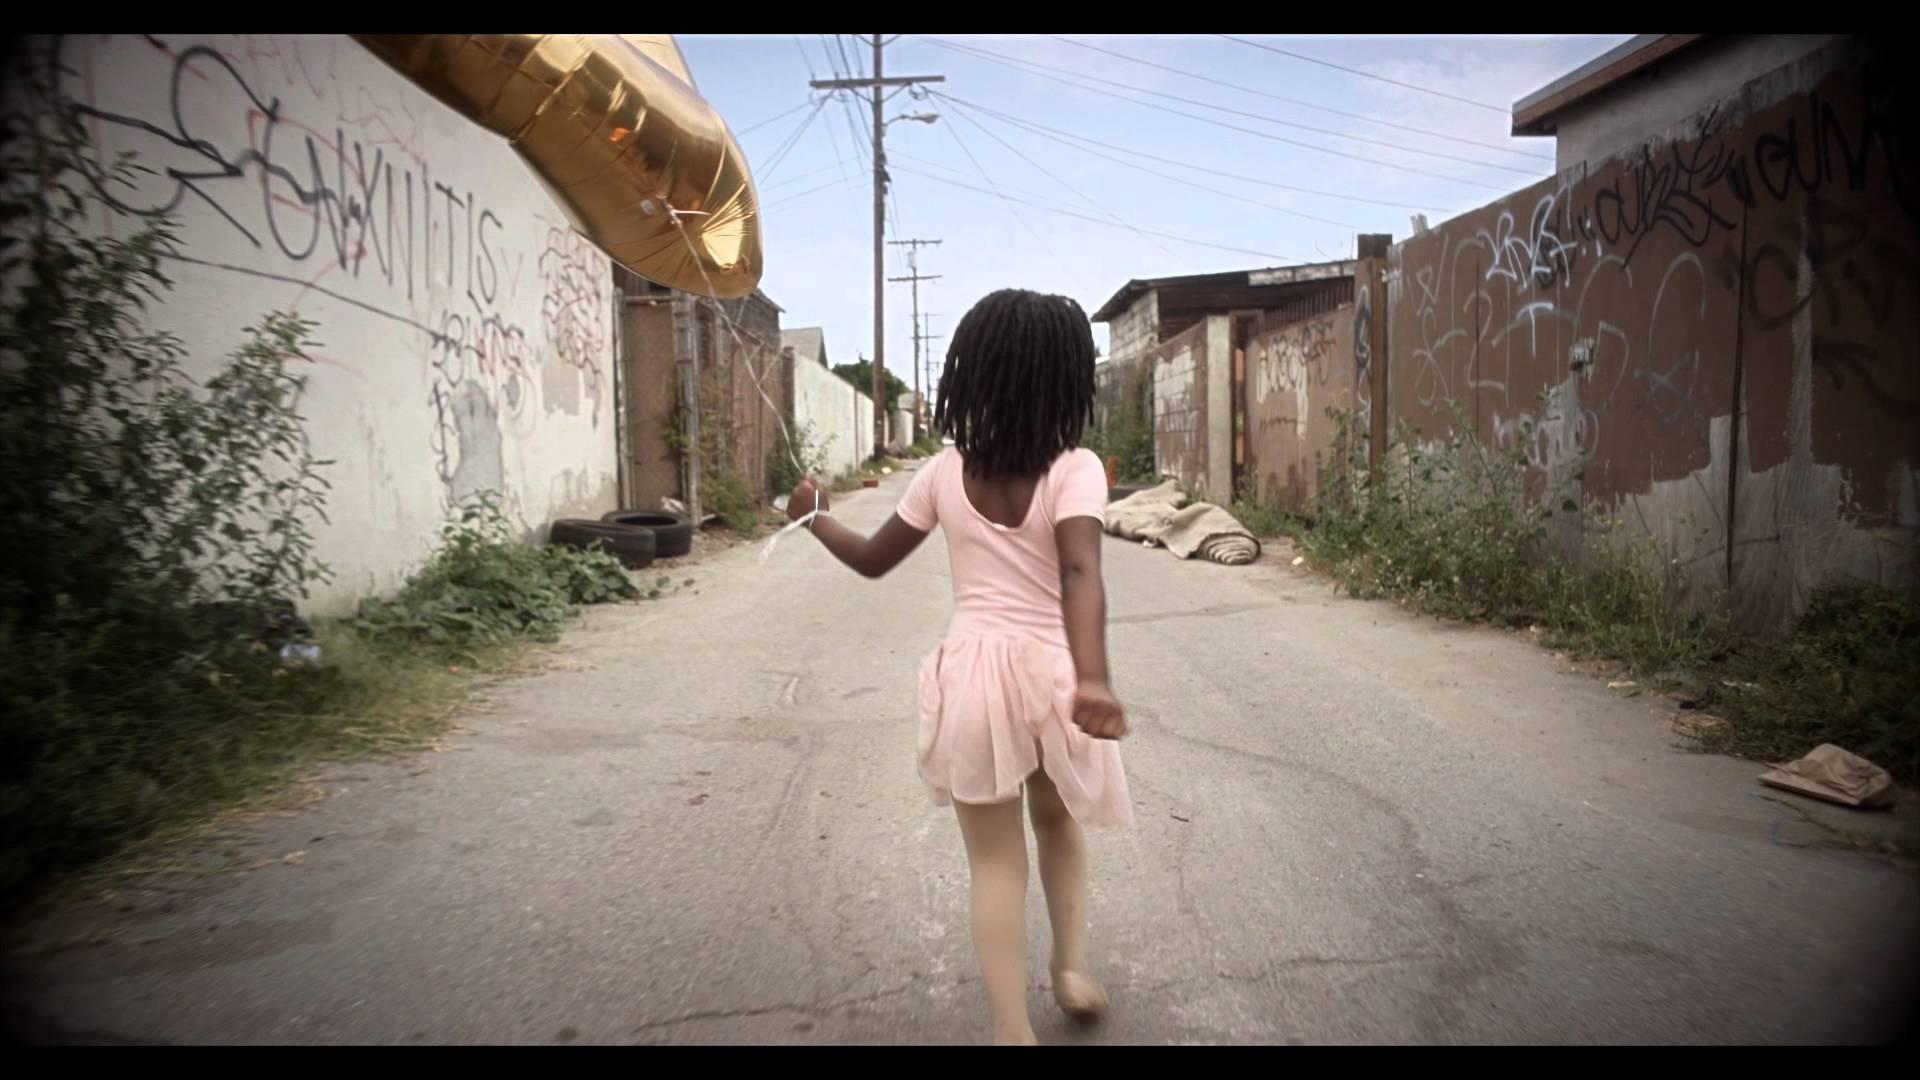 SchoolBoy Q- Break The Bank (Music Video)